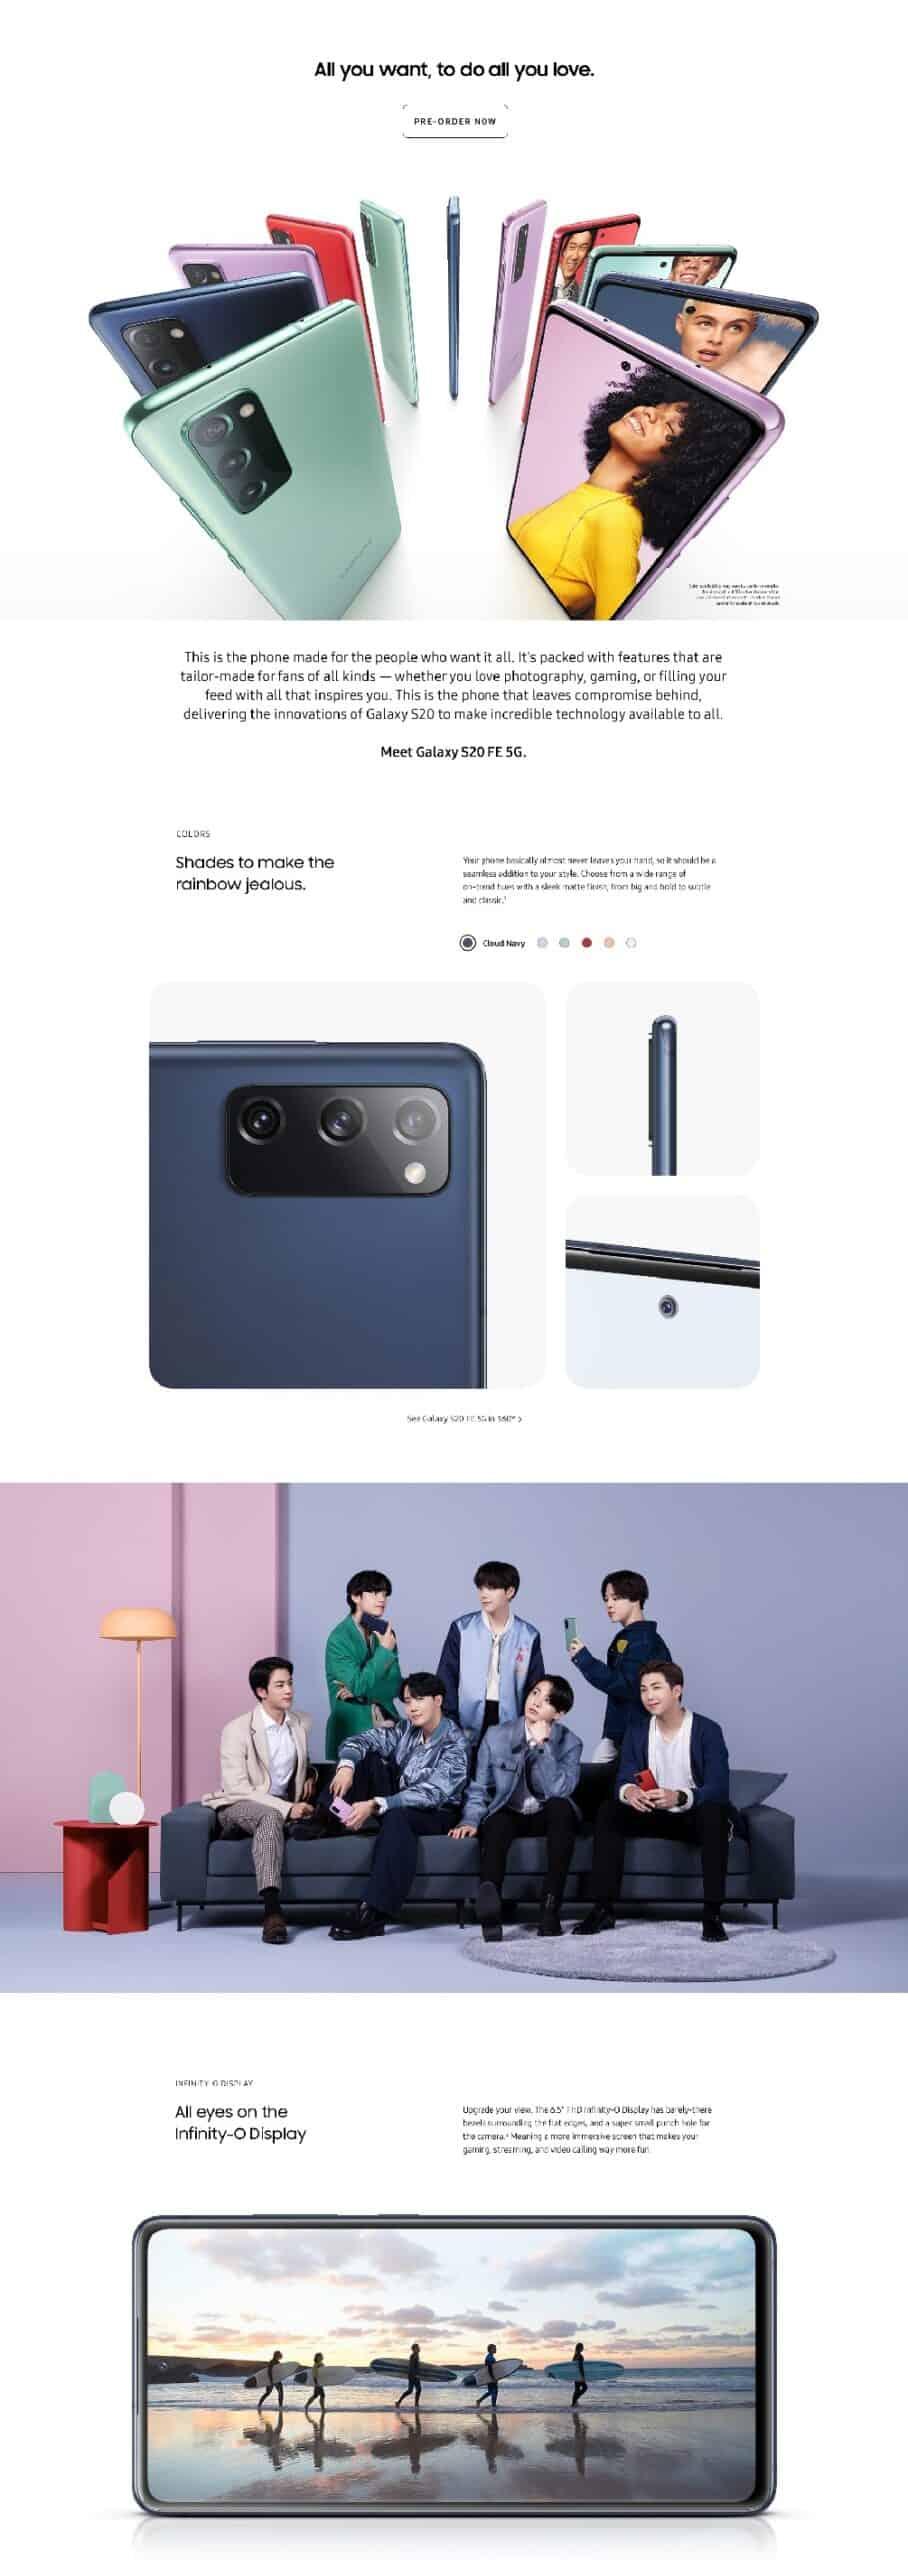 Samsung Galaxy S20 FE infographic leak 1